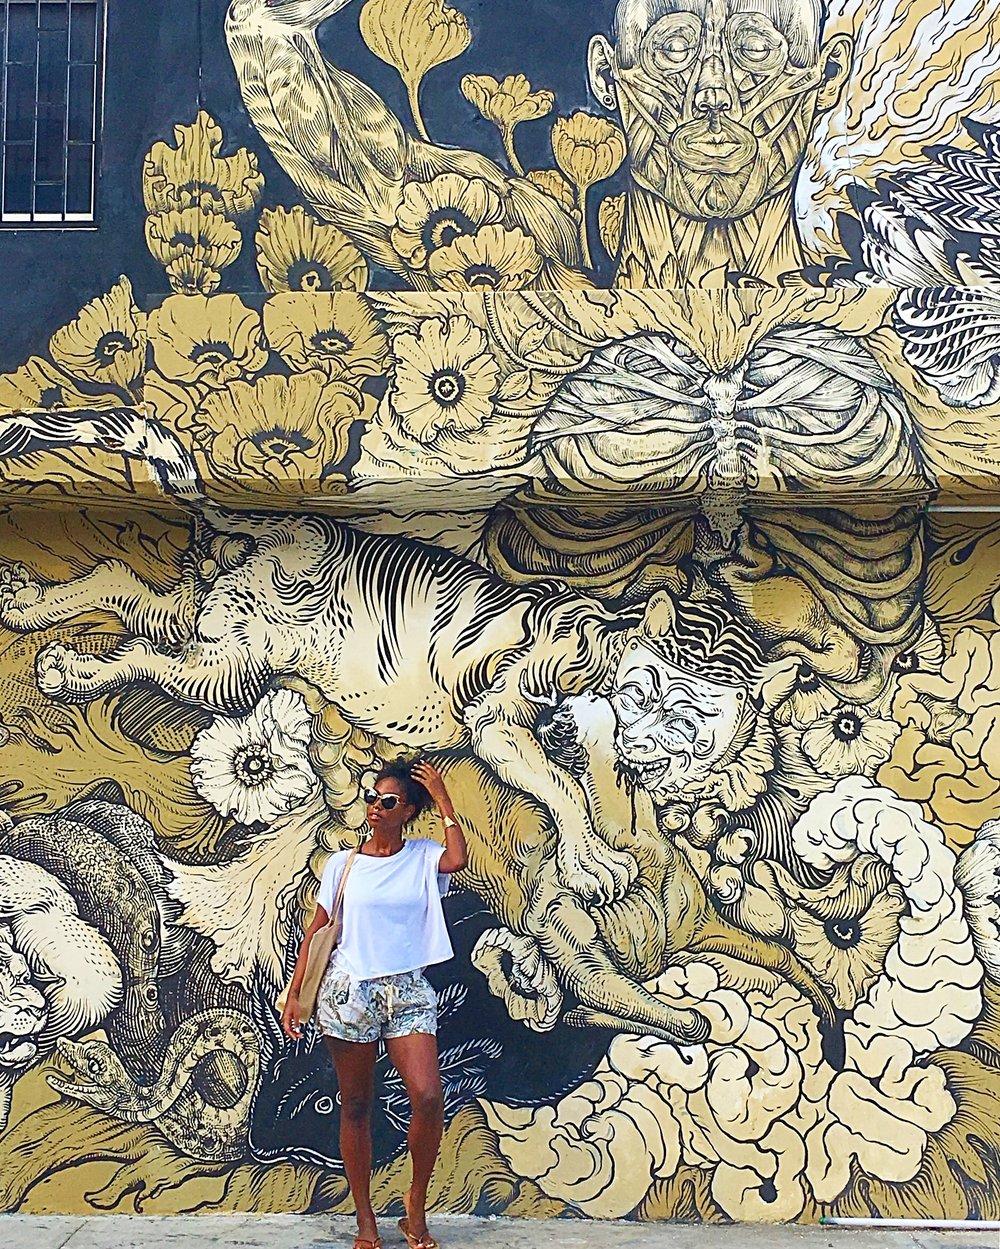 Playa del Carmen Murals_StreetArt-5